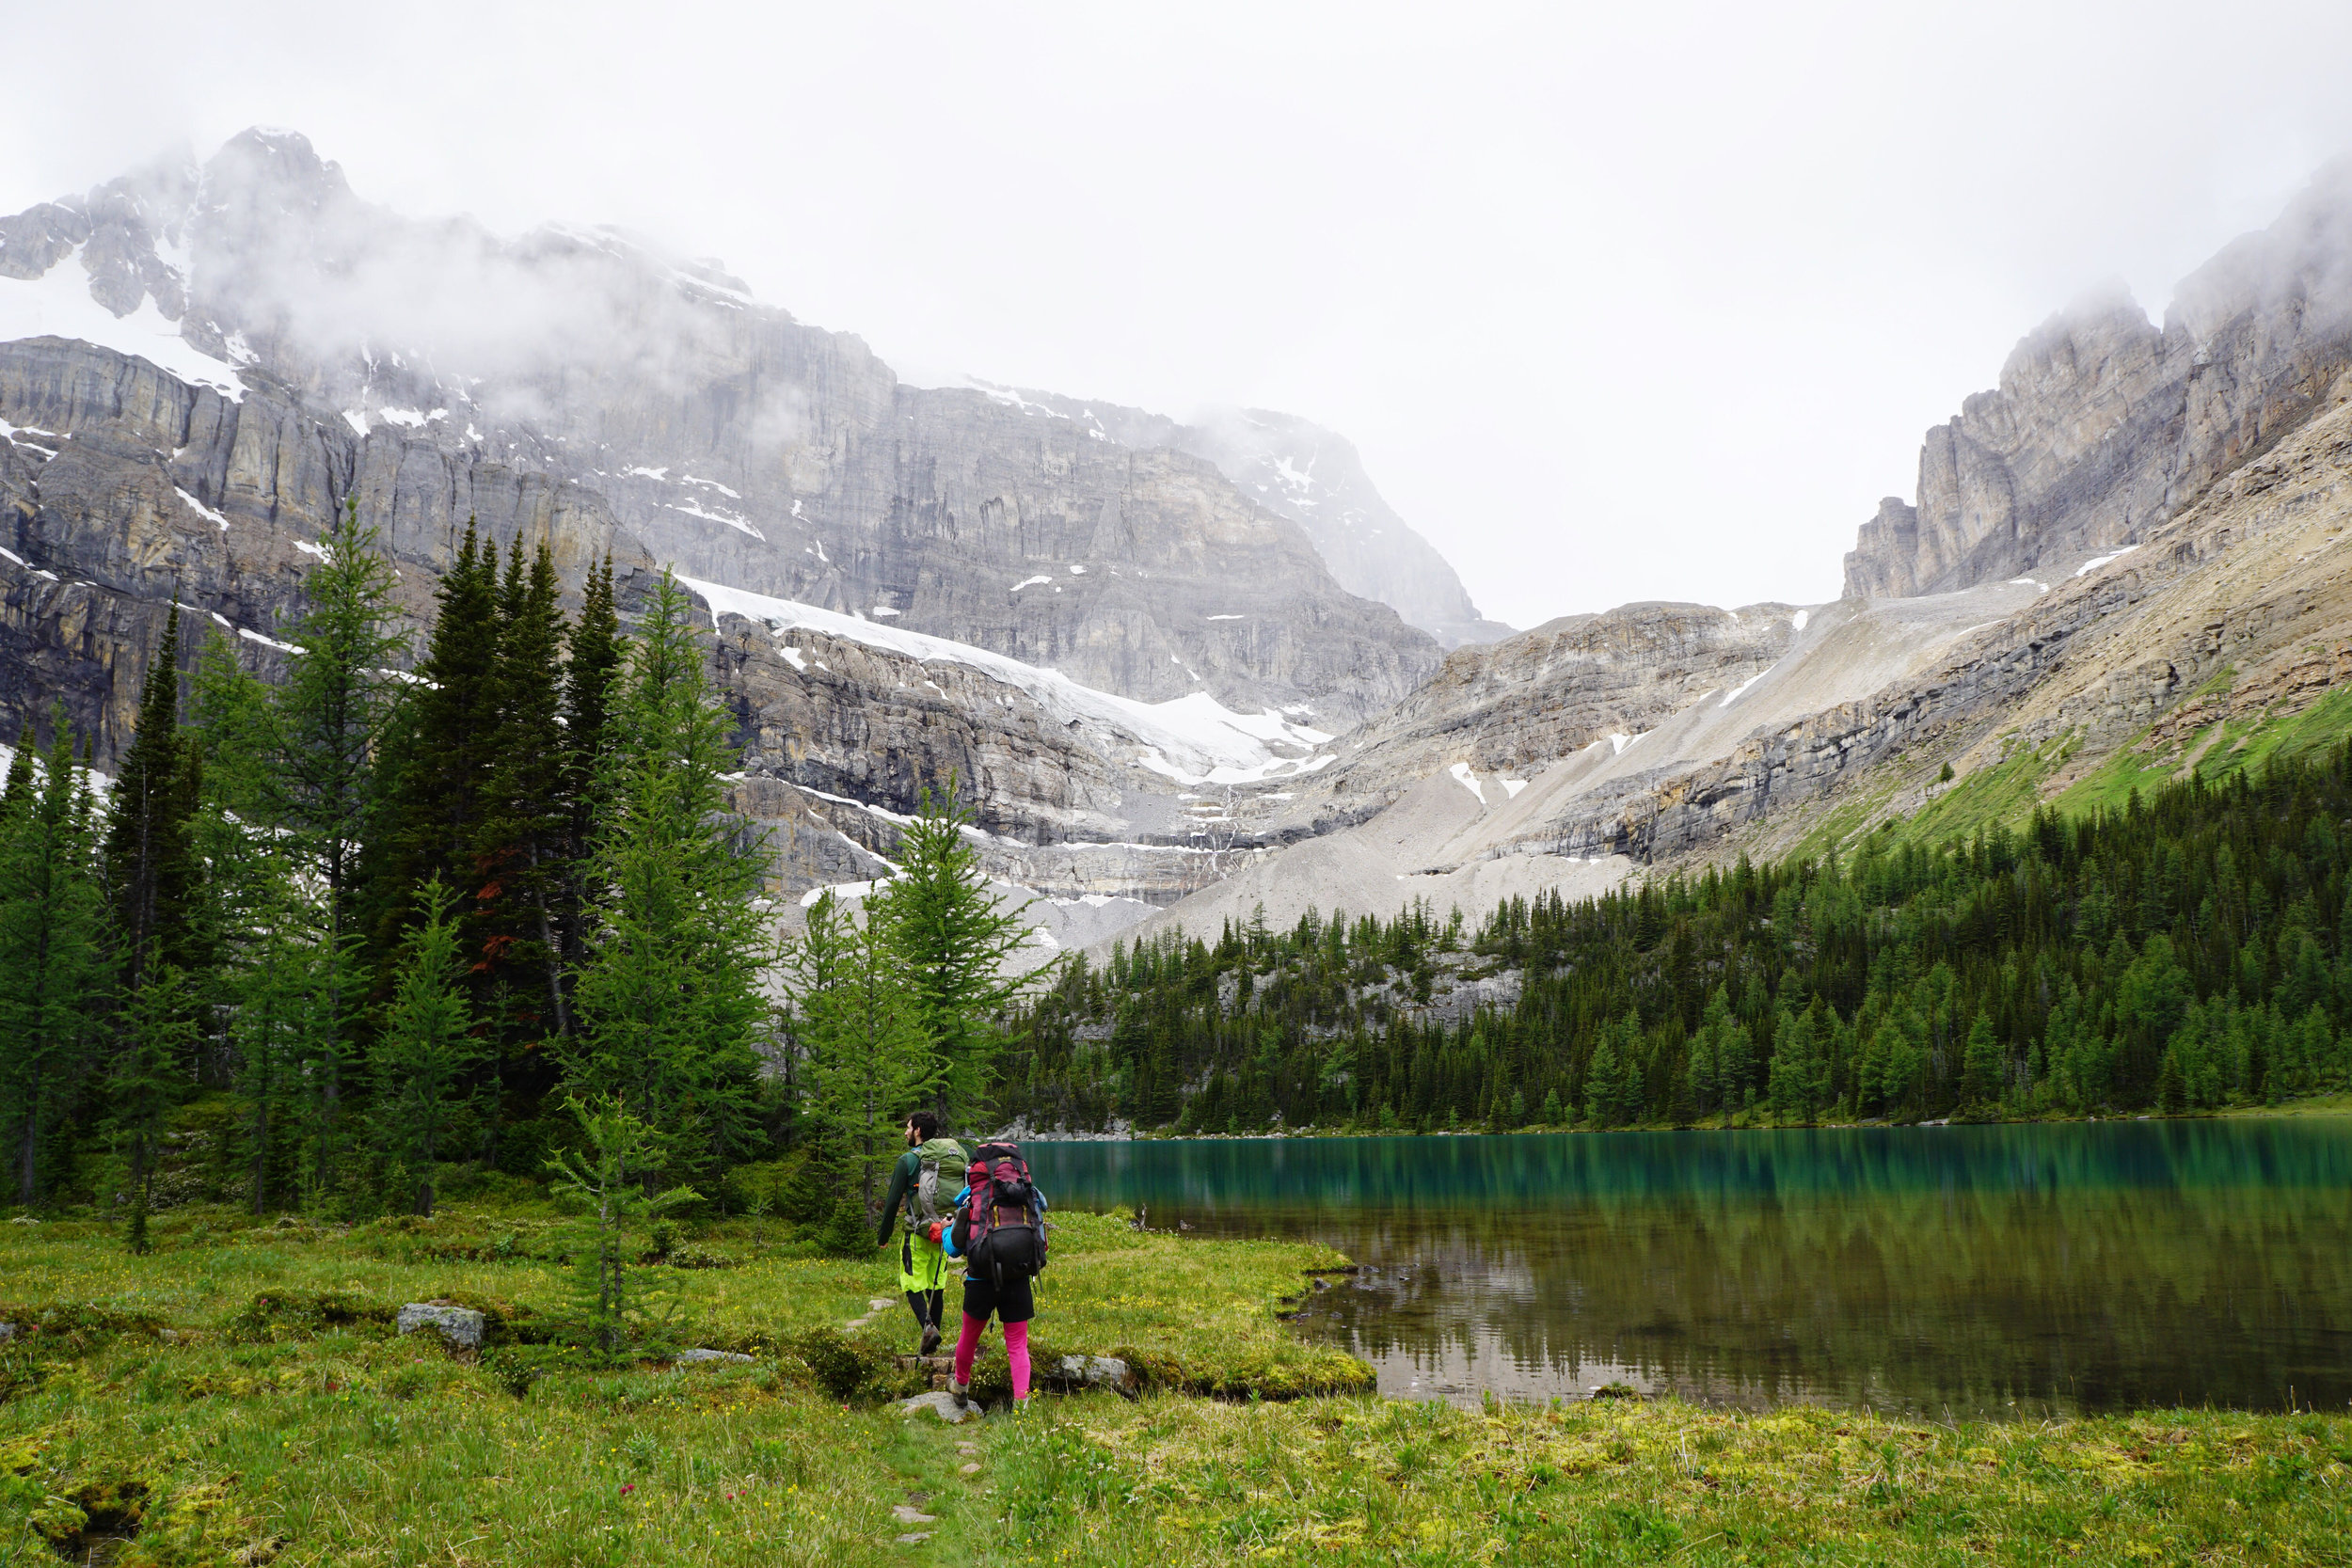 The hike through Deception Pass.